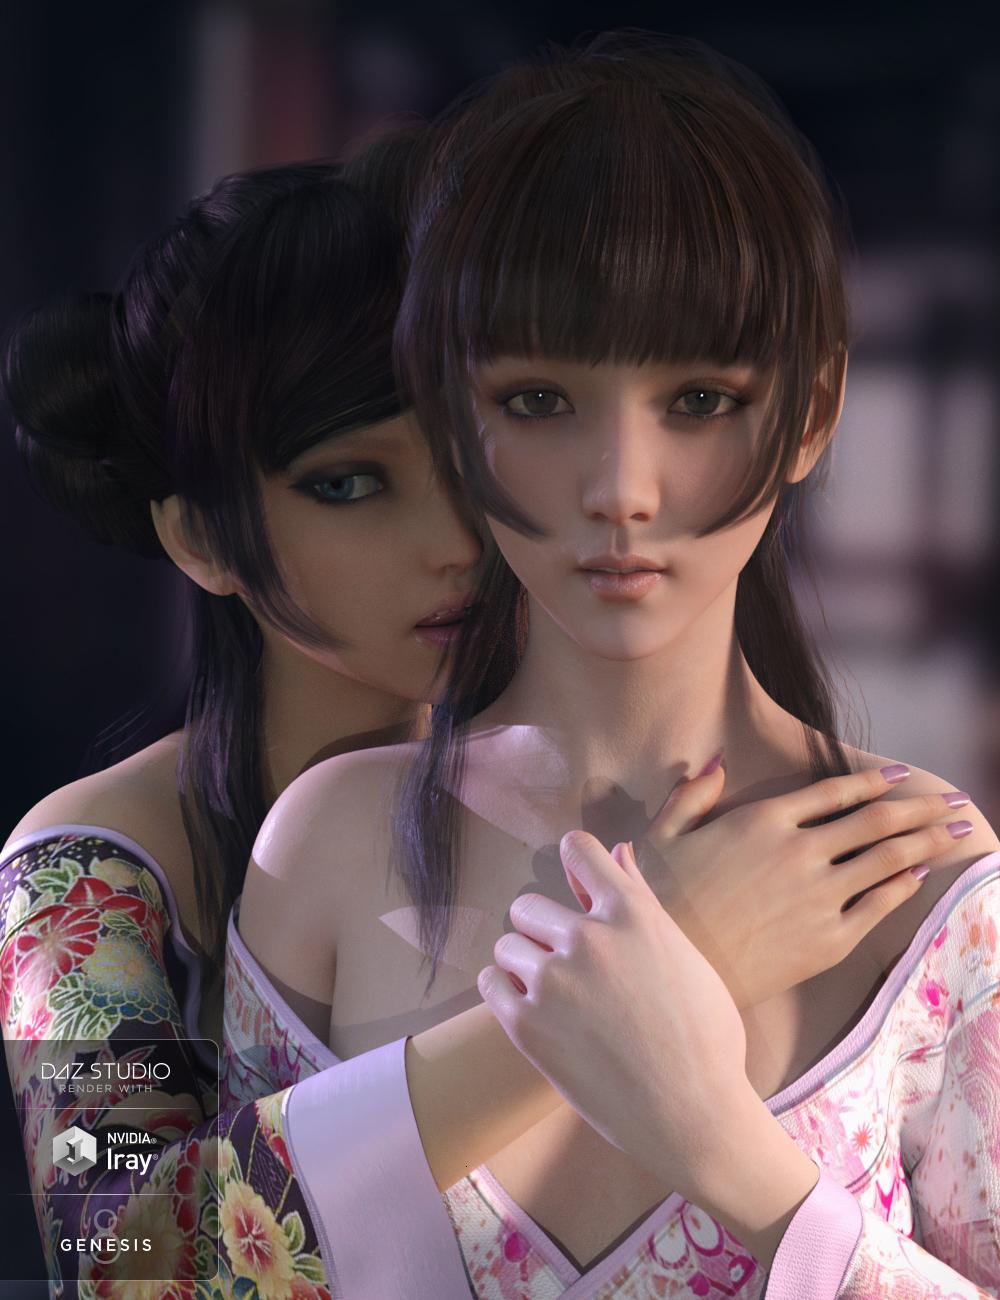 Nyo Hair for Genesis 8 Female(s) by: Crocodile Liu, 3D Models by Daz 3D